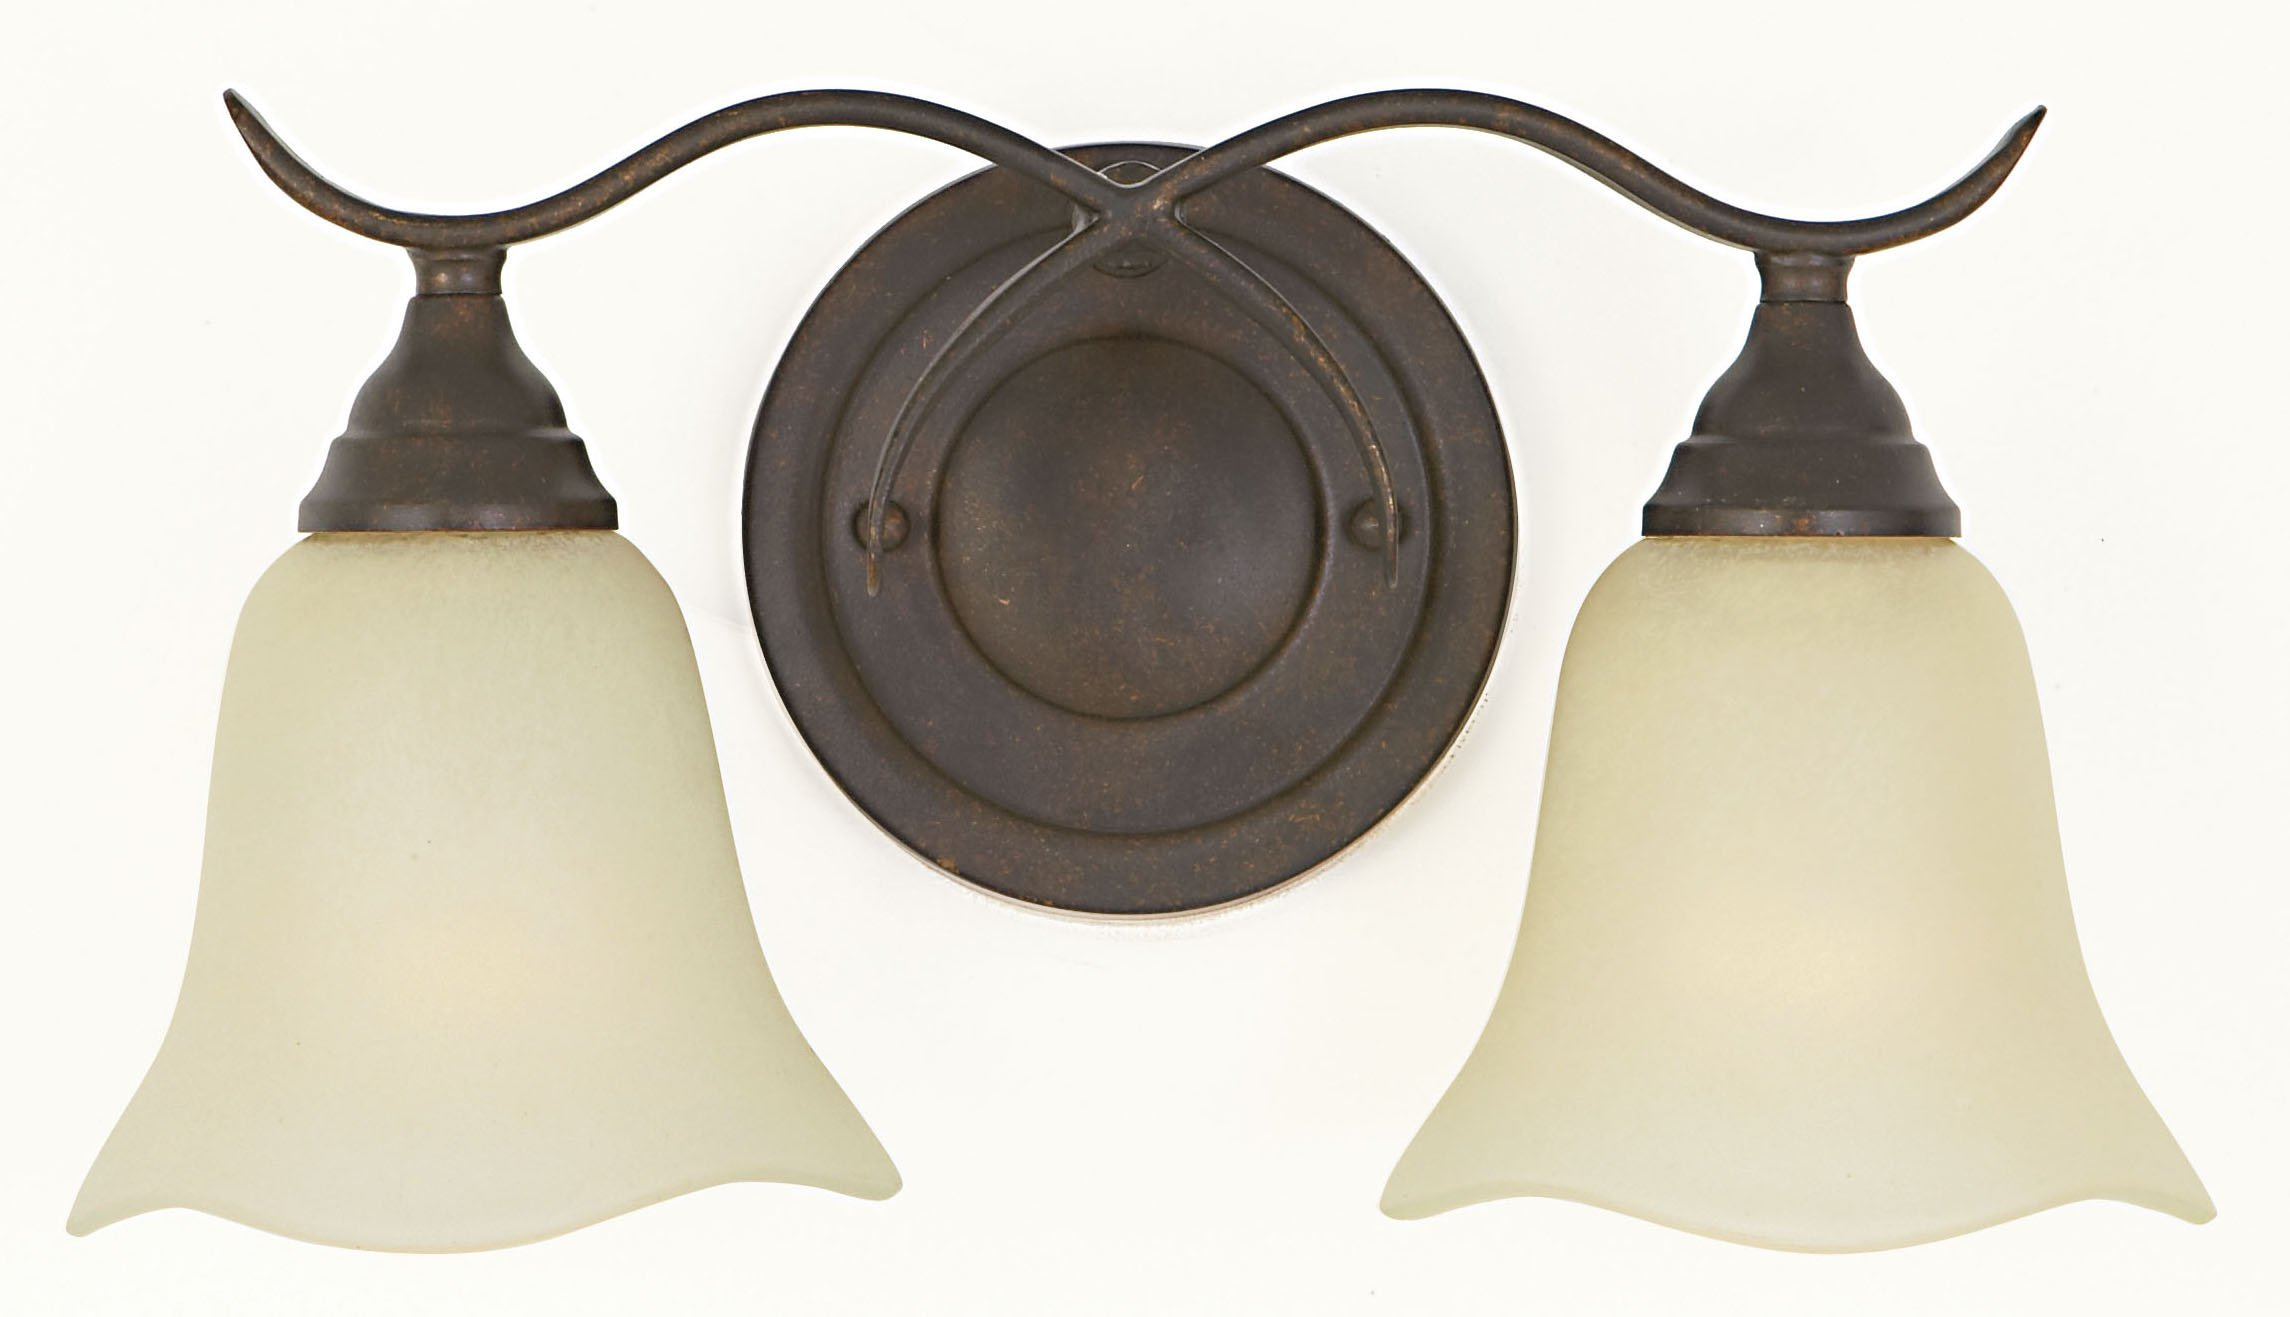 Feiss VS10602-GBZ Morningside Glass Wall Vanity Bath Lighting, Bronze, 2-Light (15''W x 8''H) 200watts